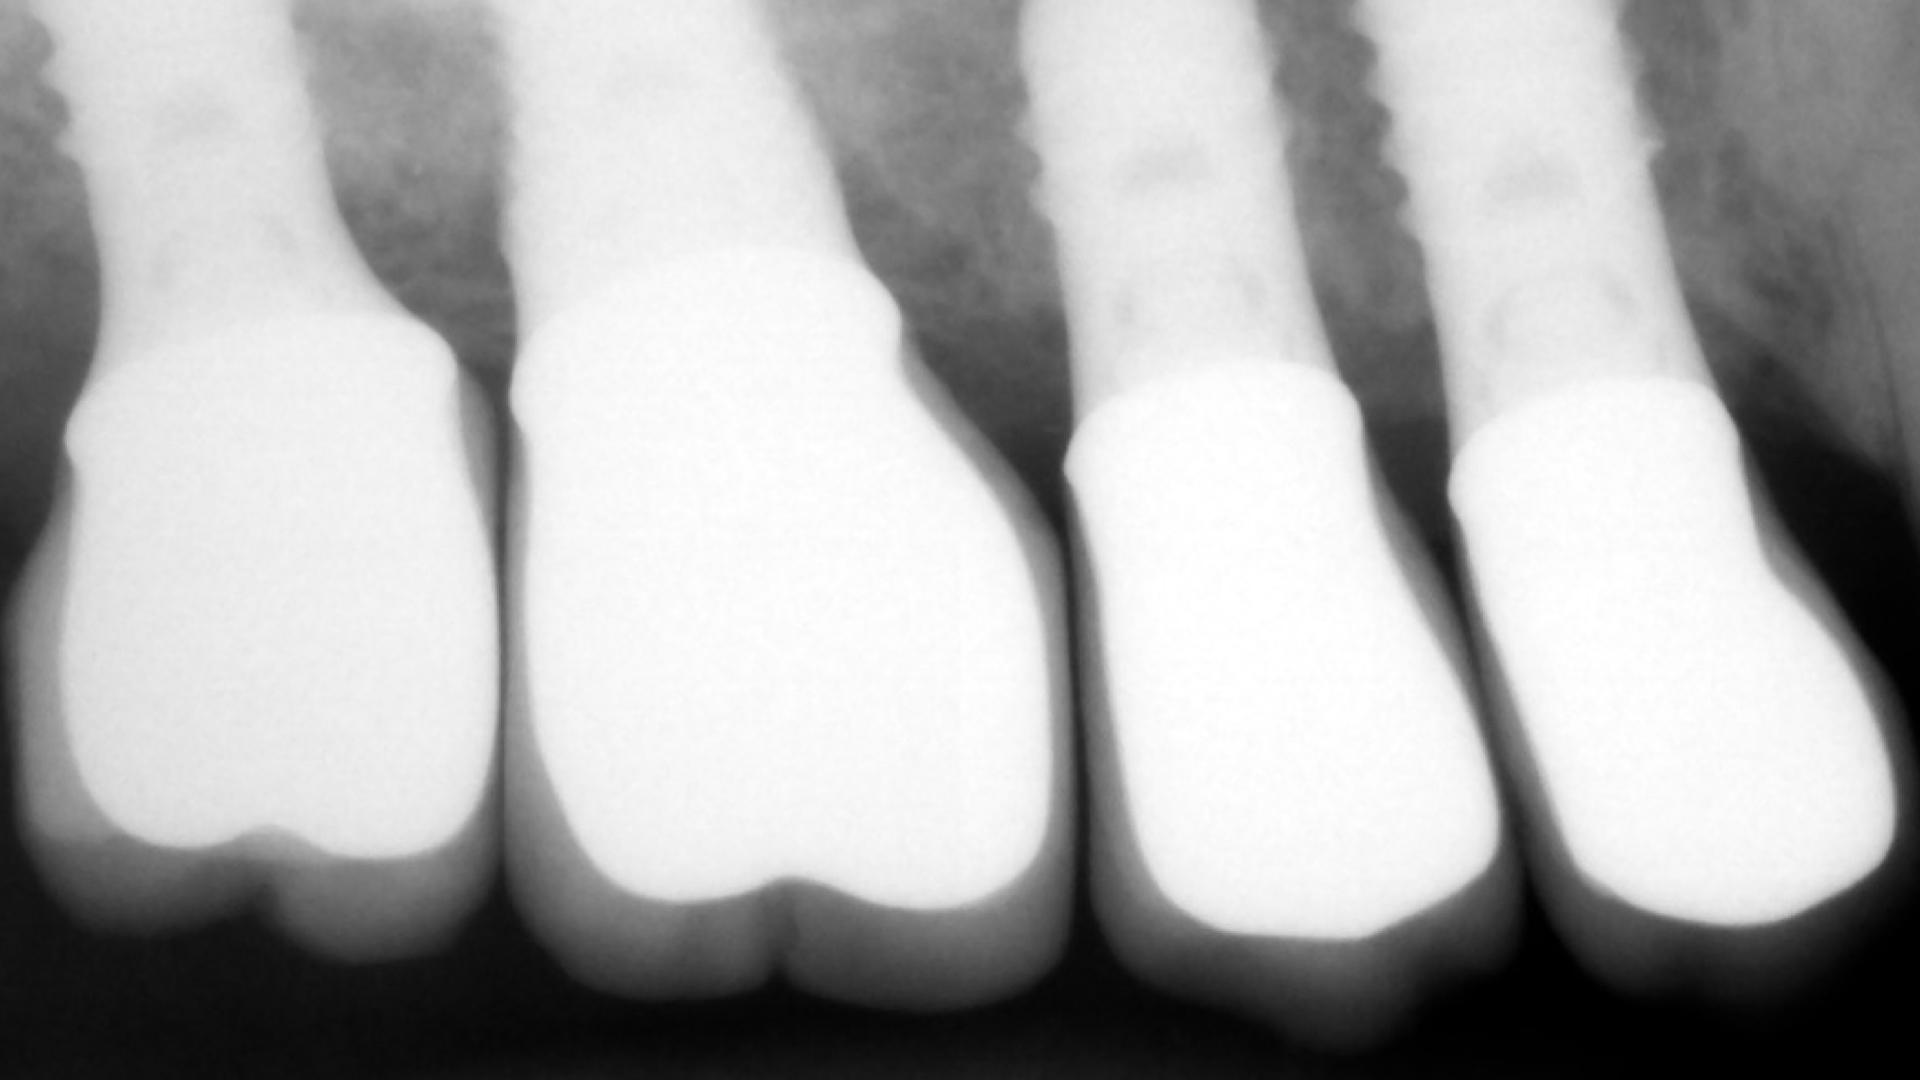 chronic-pain-dental-implant-peri-implantitis-mucositis-airflow-prophylaxis-master-kazemi-oral-surgery-3